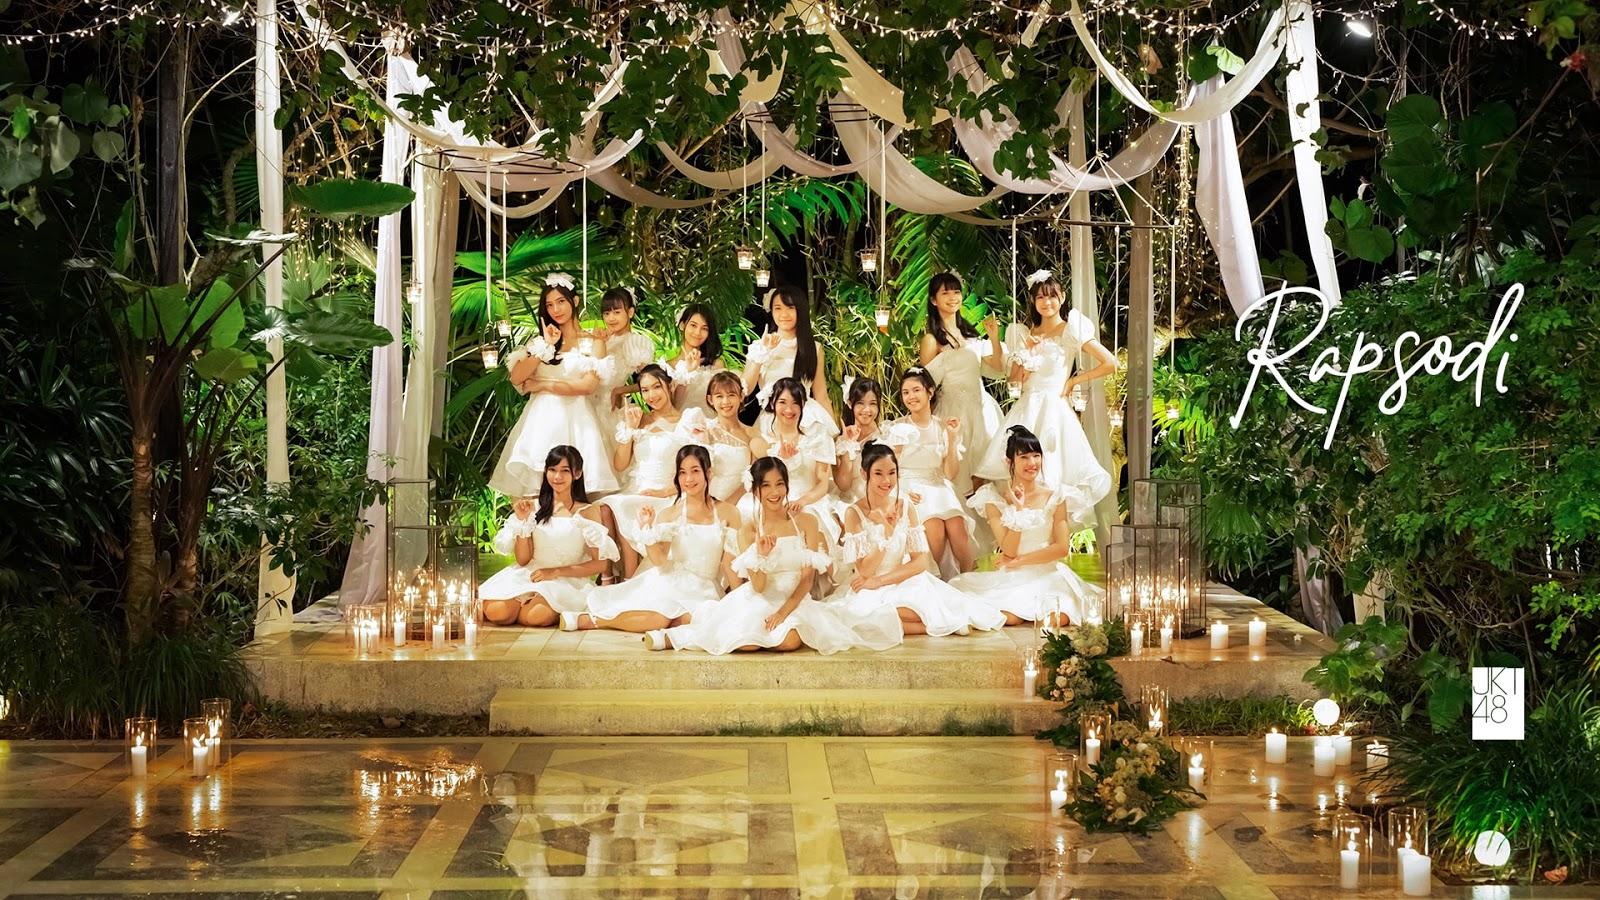 JKT48 Release Single Original Pertama, Rapsodi